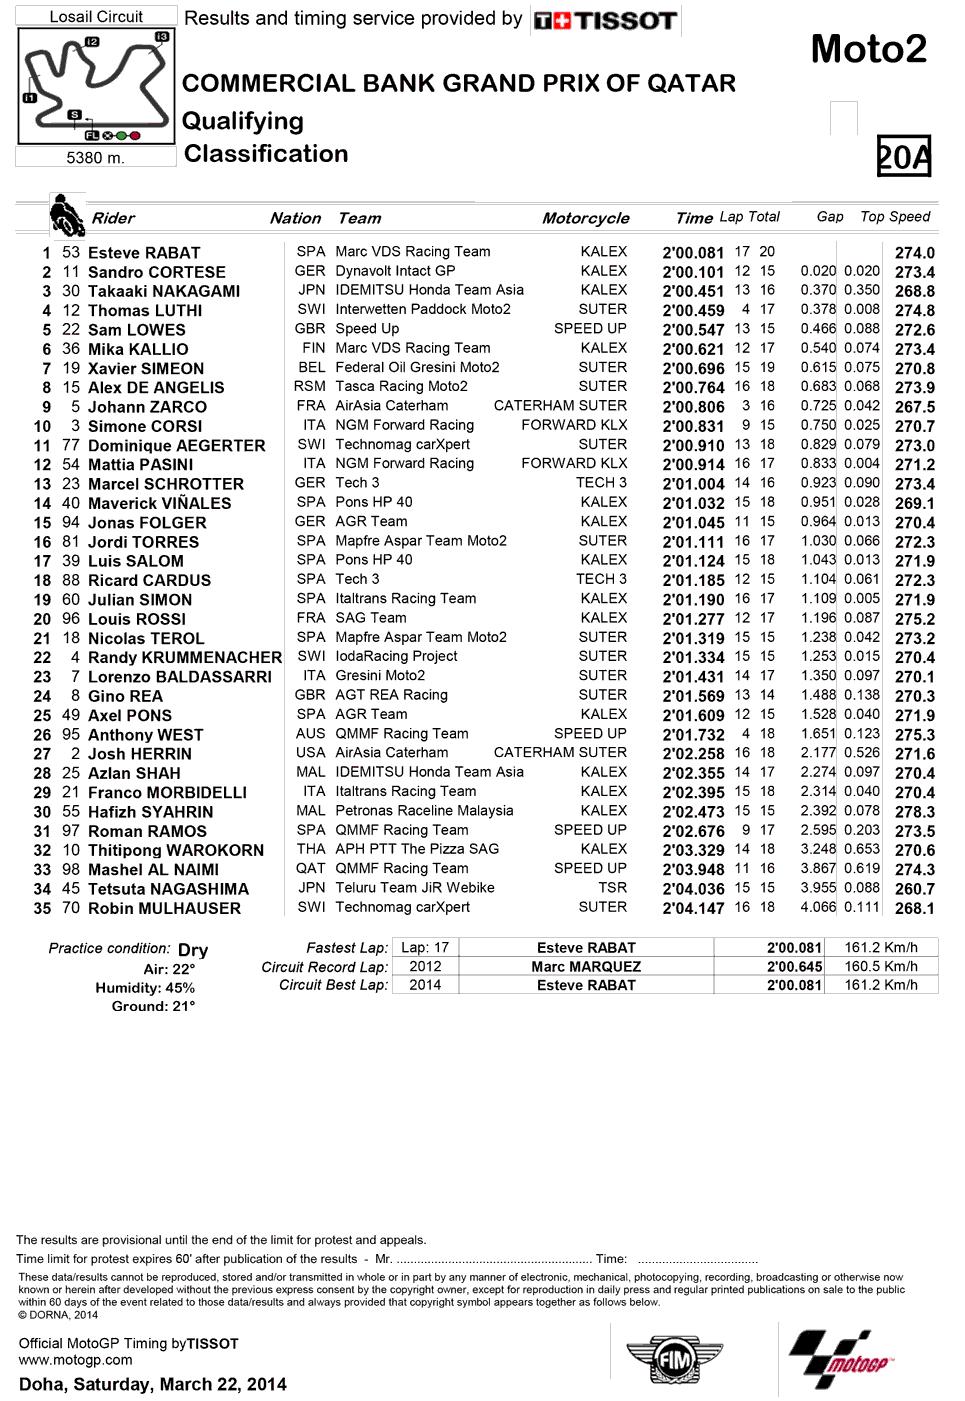 Результаты квалификации Moto2 Гран-При Катара 2014